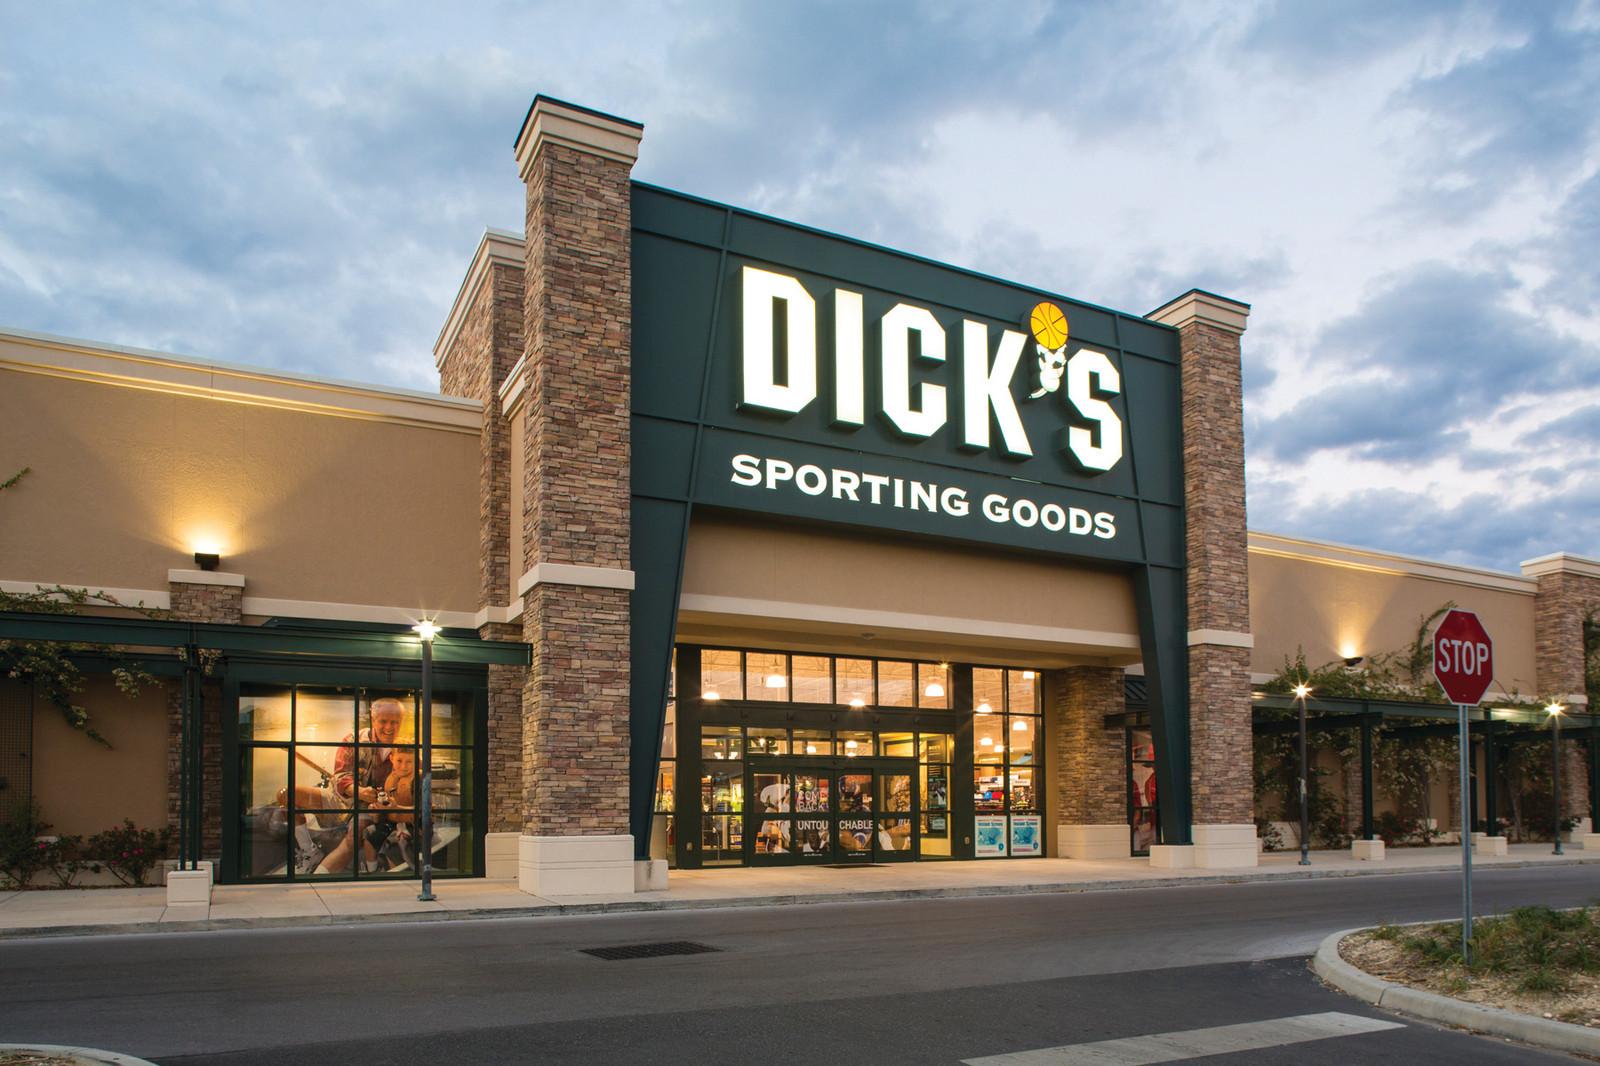 Dicks sporting goods florence kentucky